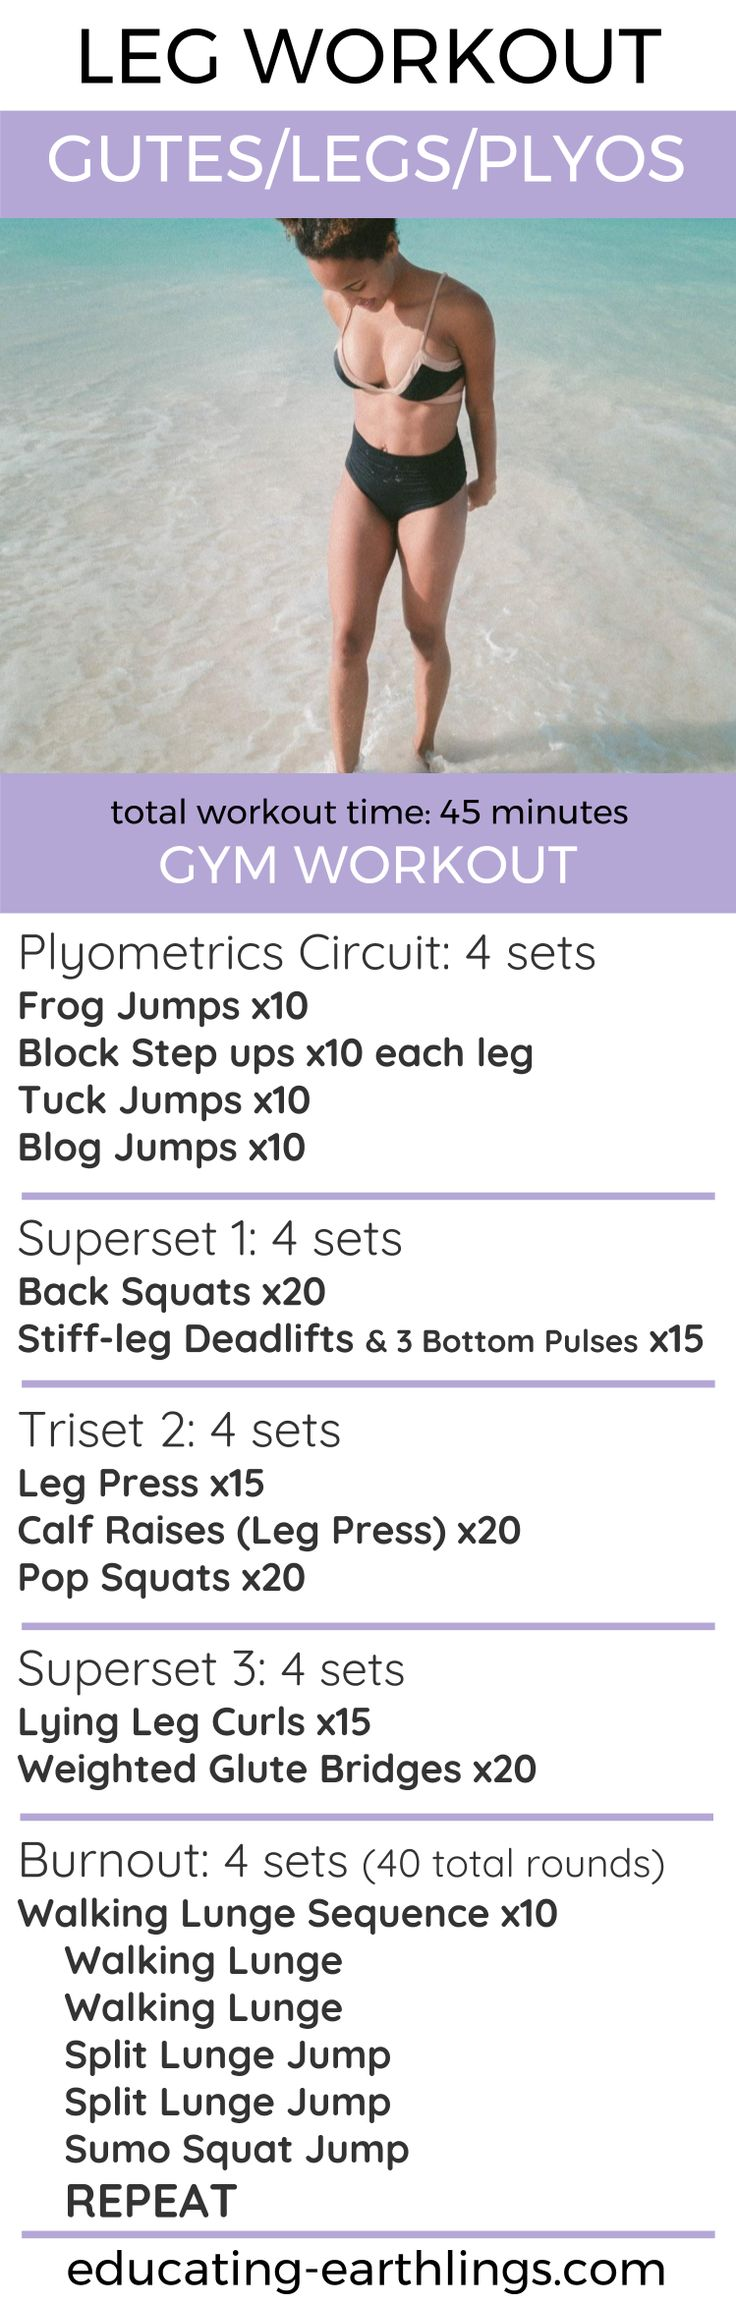 Leg Workout: Push-Pull-Legs Split, glute workout, plyometrics, booty workout, butt workout, squats, women's fitness, vegan fitness, plant based life, plant based fitness, workout plans, free workouts, free workout plans